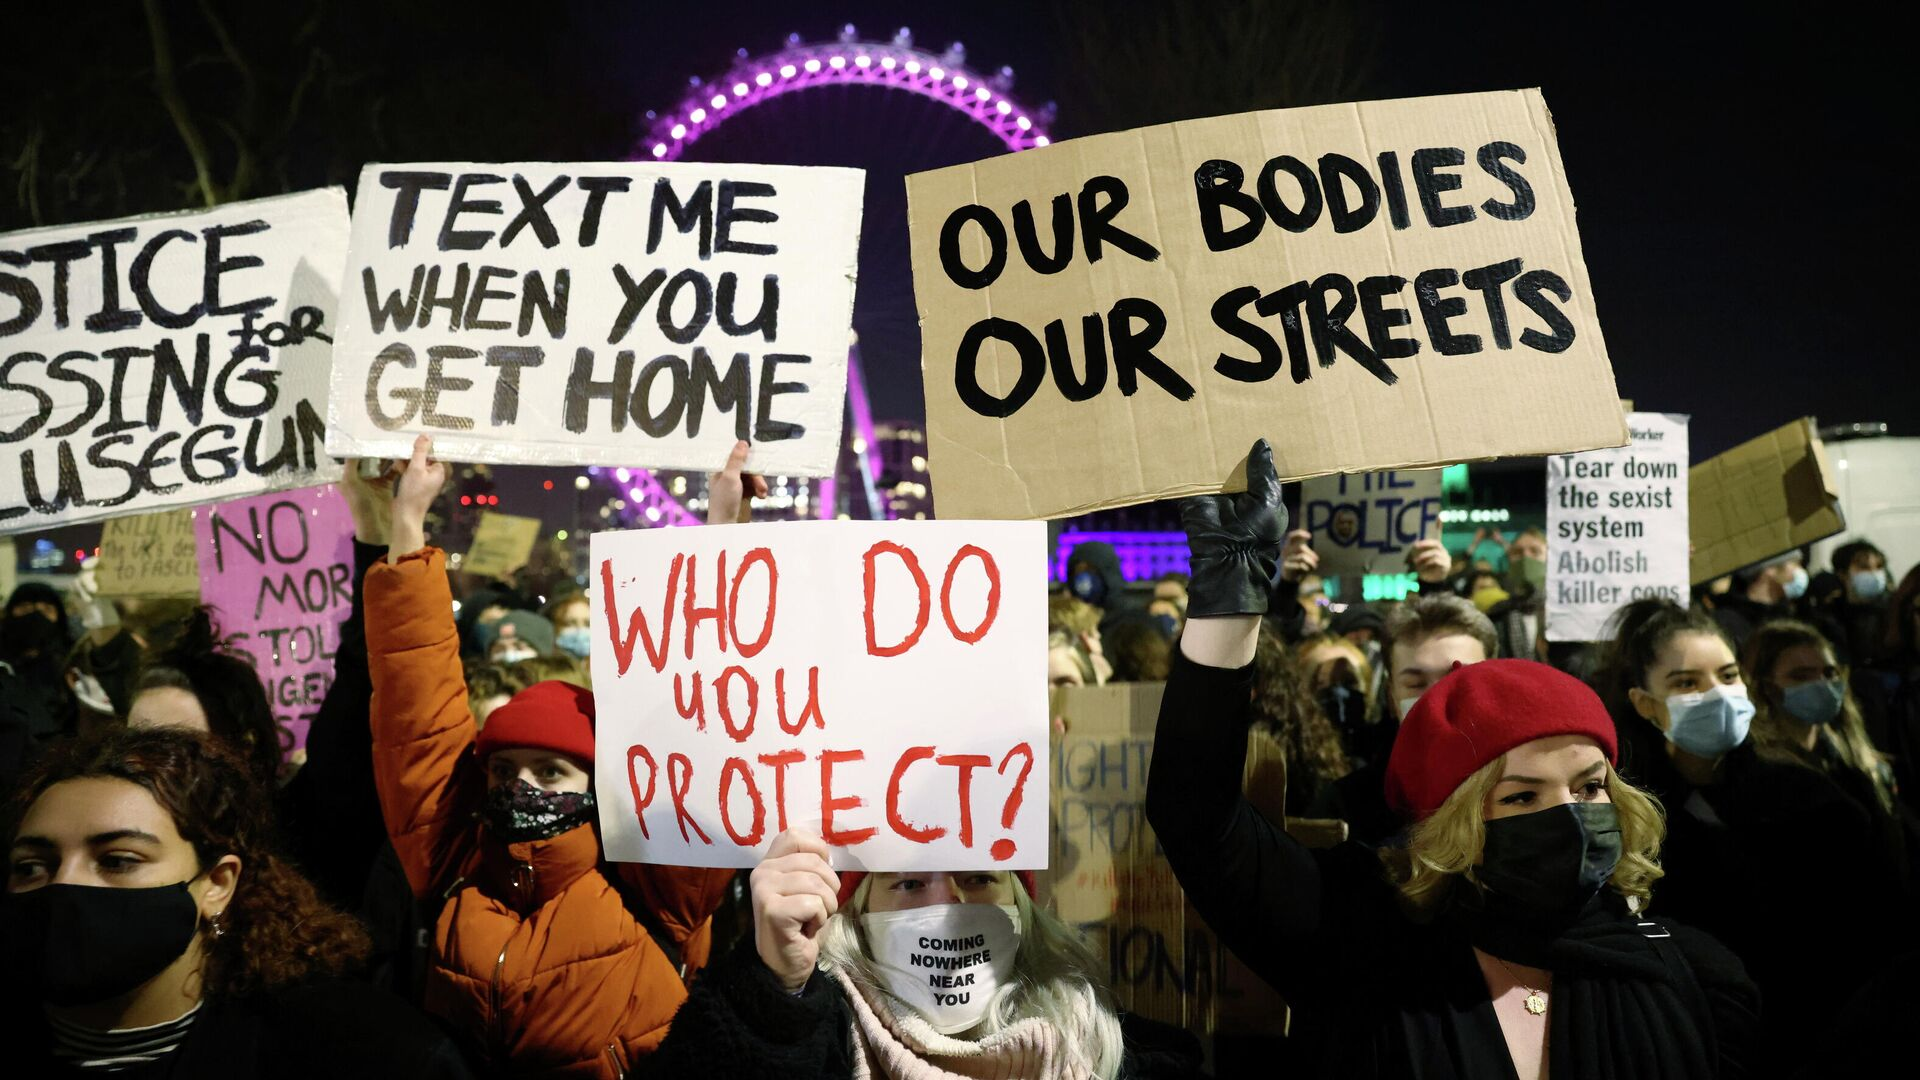 Protestas en Londres, tras el asesinato de Sarah Everard - Sputnik Mundo, 1920, 19.03.2021